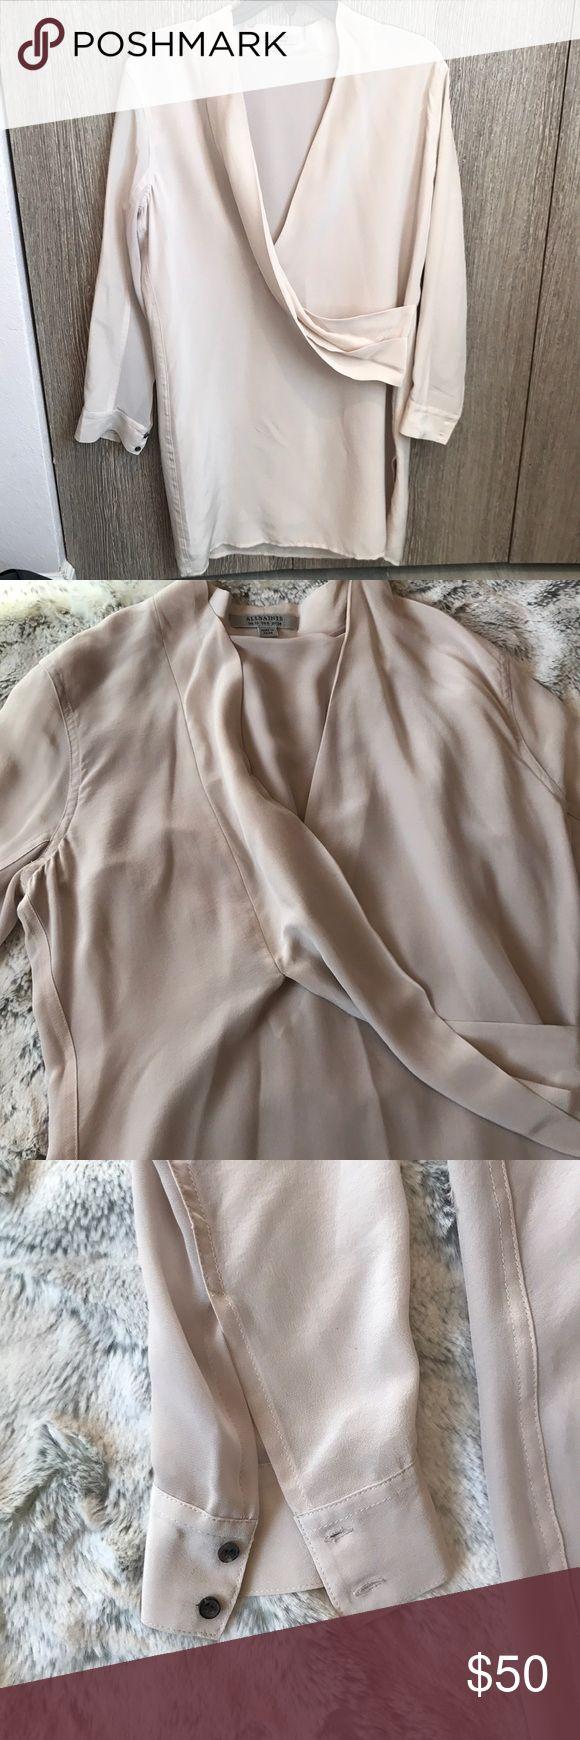 ALLSAINTS dress Beautiful all saints dress. Only worn once, size 6 cream/blush color All Saints Dresses Midi